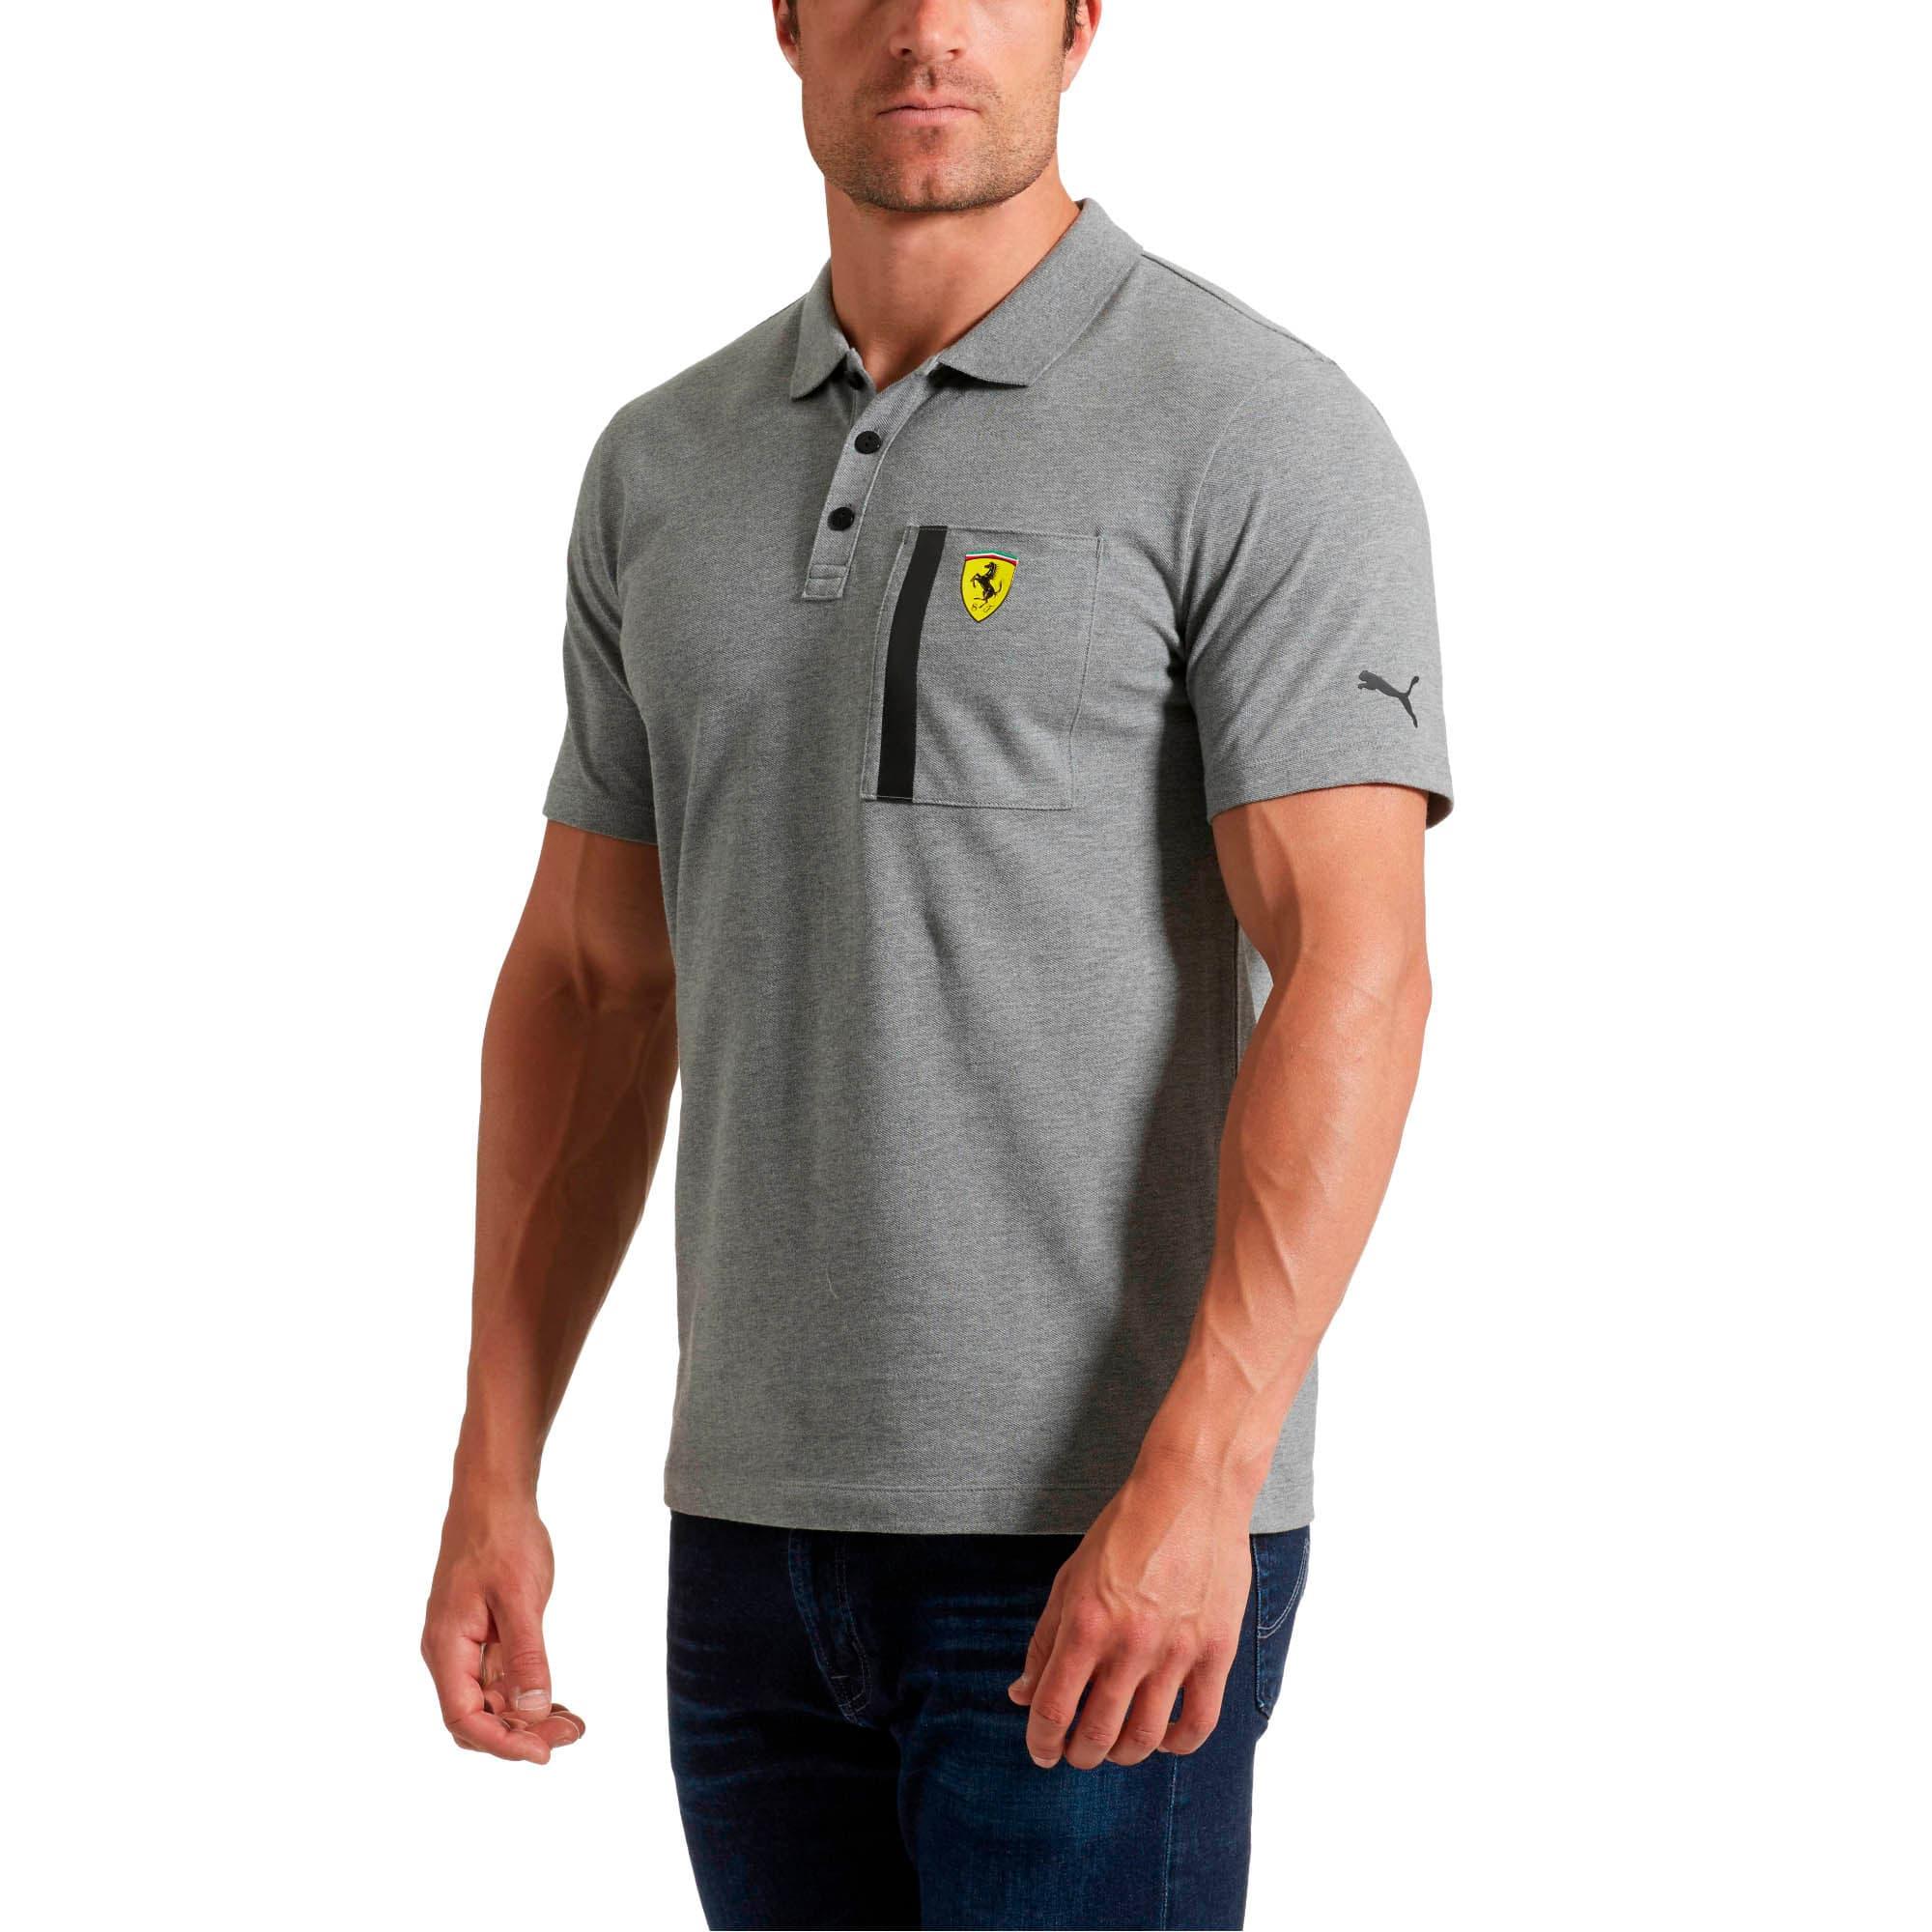 Thumbnail 2 of Ferrari Polo Shirt, Medium Gray Heather, medium